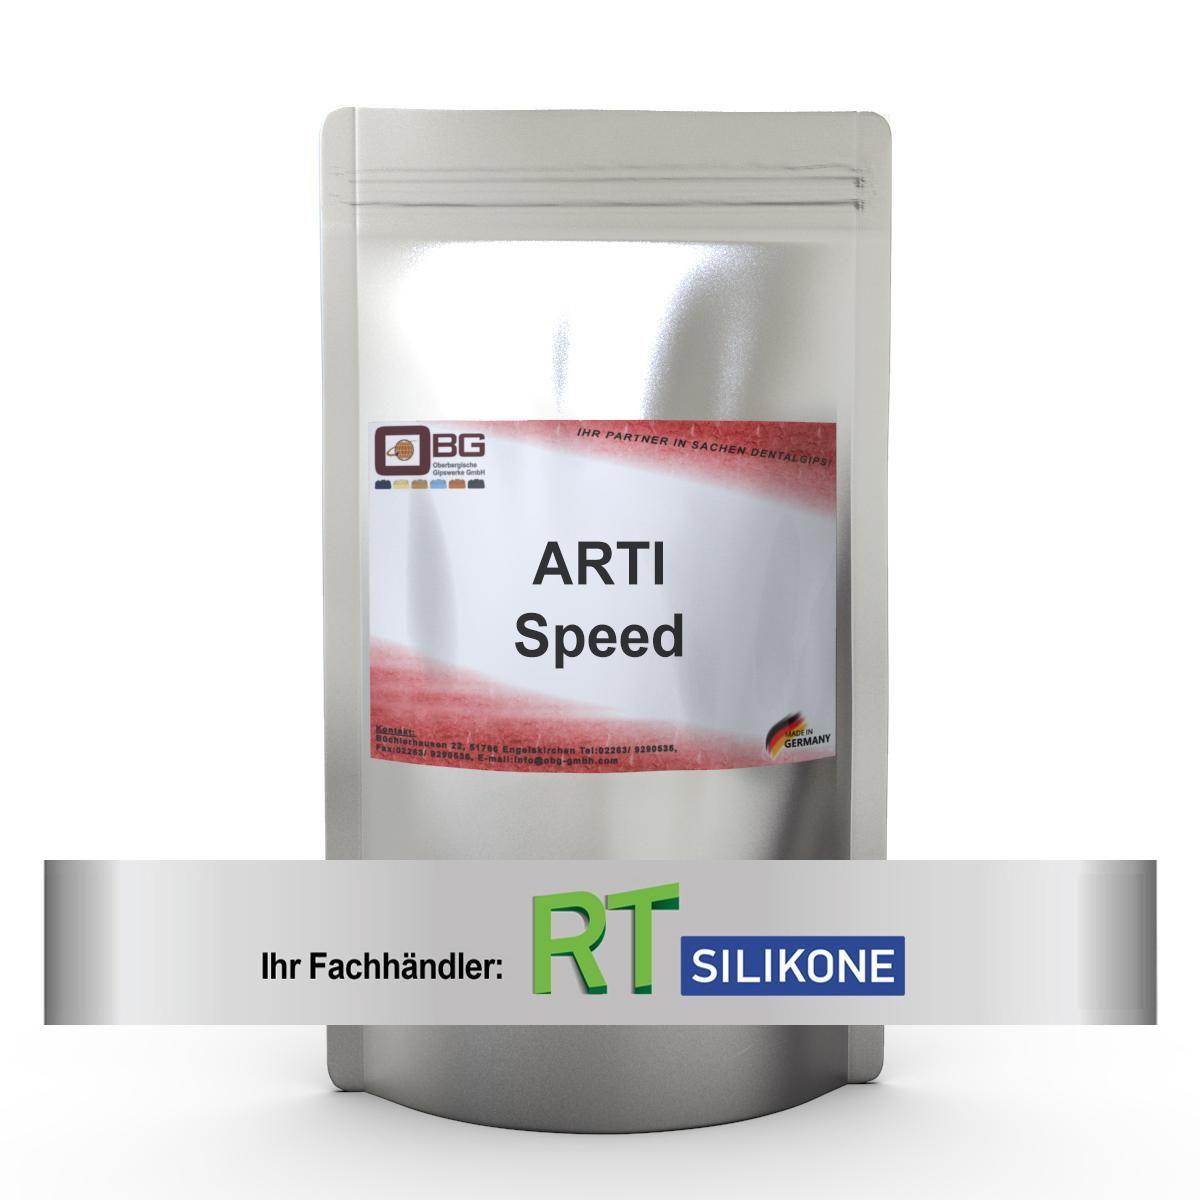 ARTI Speed Artikulationsgips extraweiß